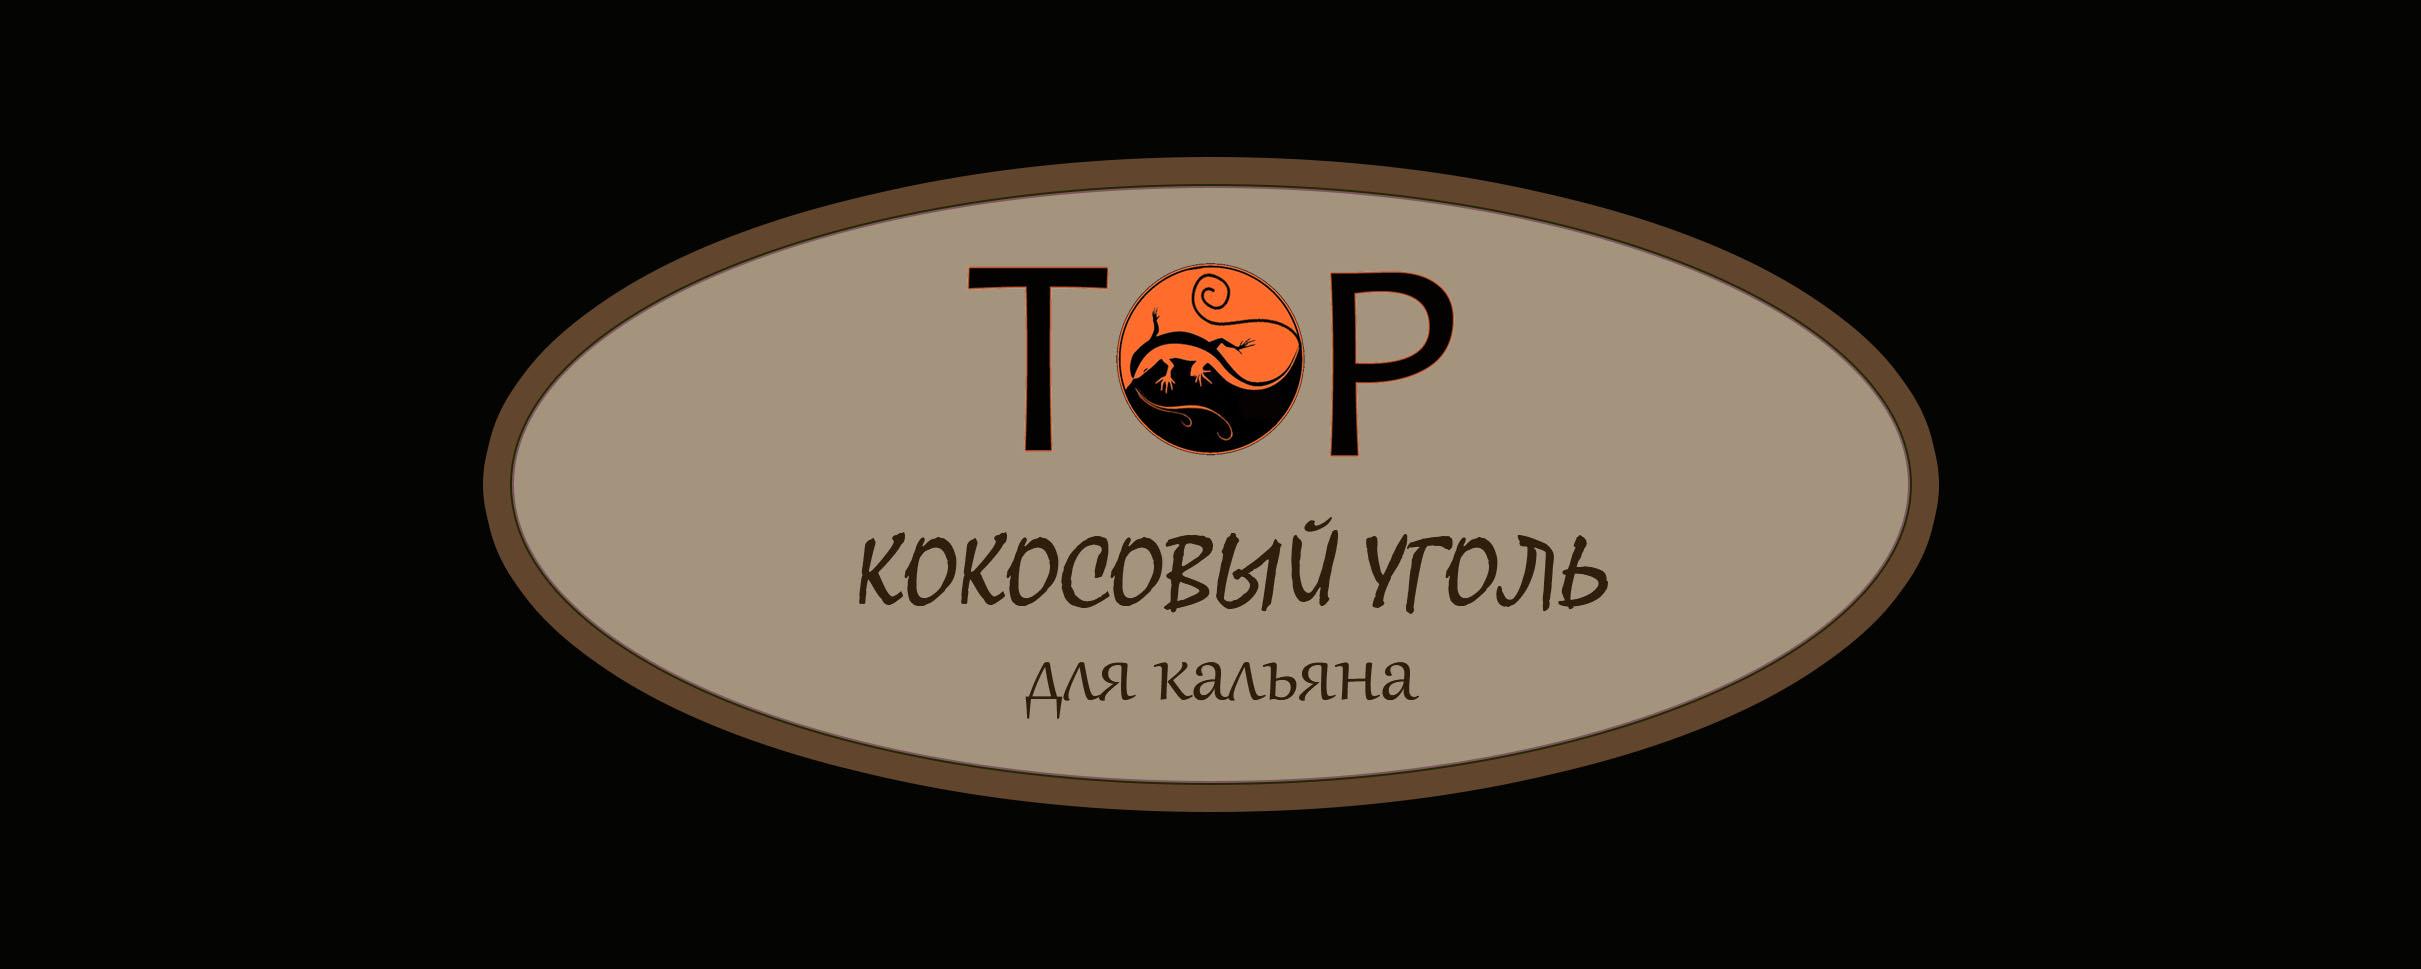 Разработка дизайна коробки, фирменного стиля, логотипа. фото f_6005c5dbf22899a0.jpg